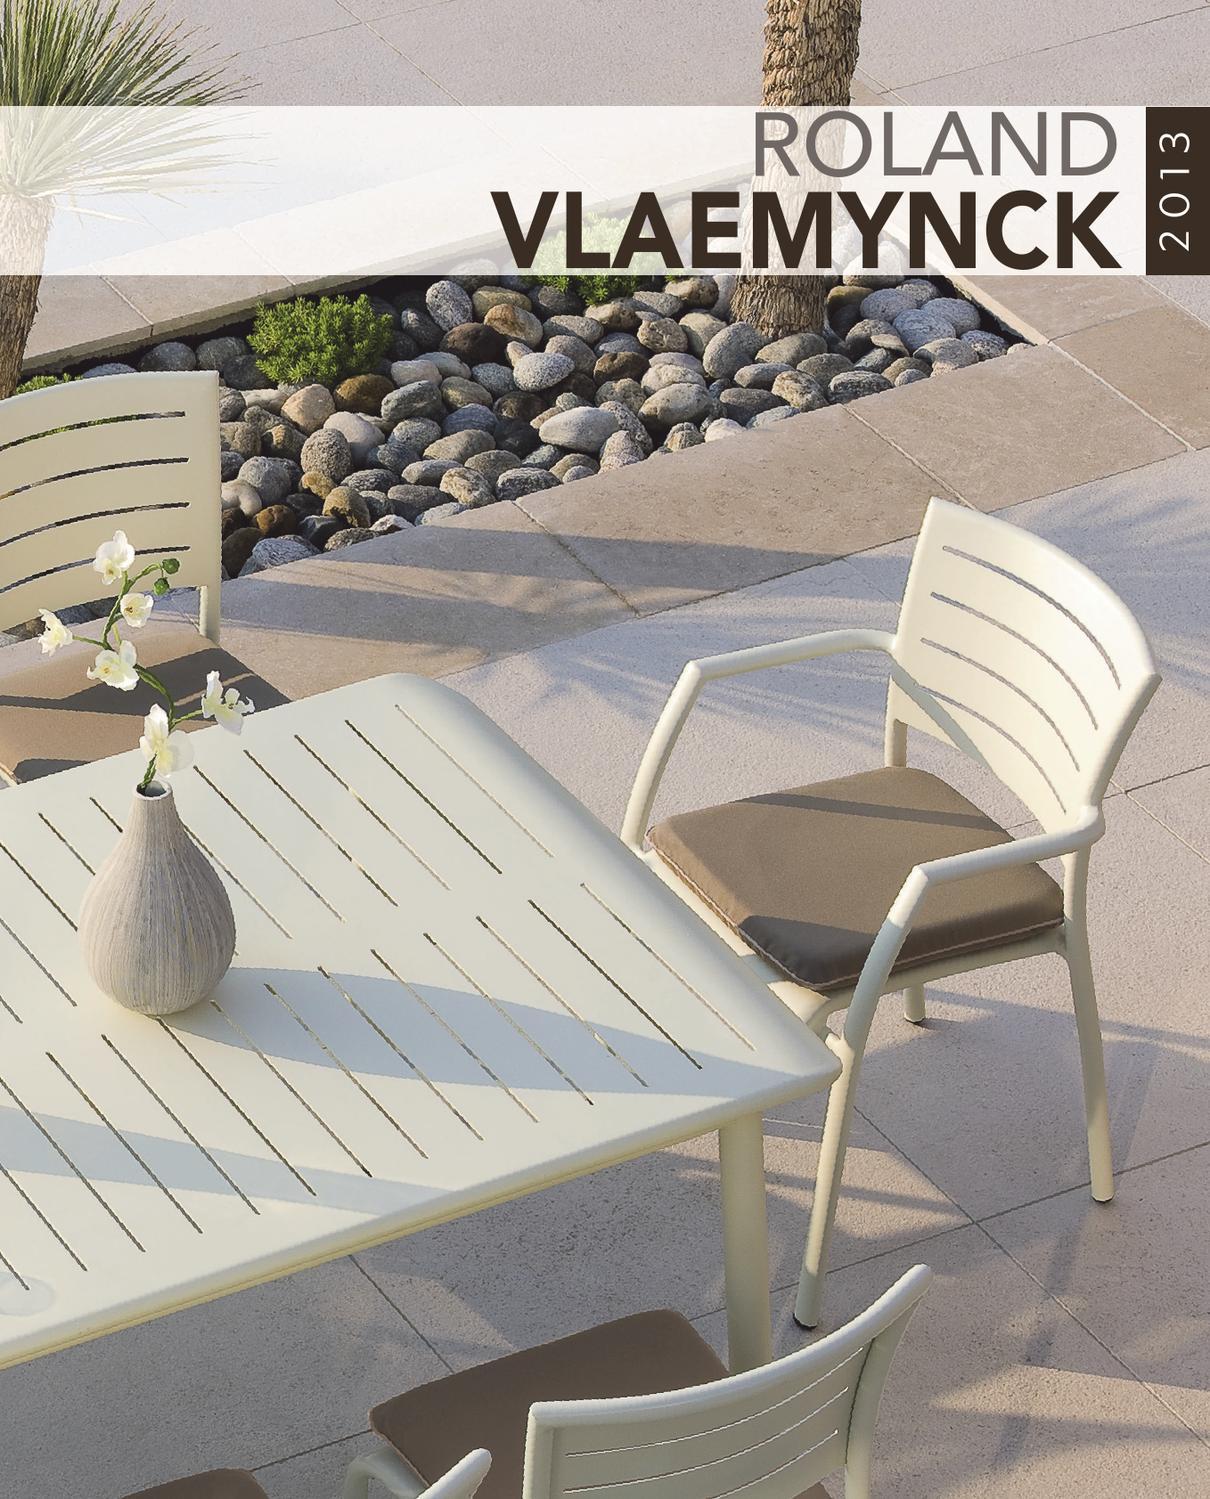 Roland Vlaemynck Outdoor Furniture Catalogue By Roland ... concernant Mobilier De Jardin Vlaemynck